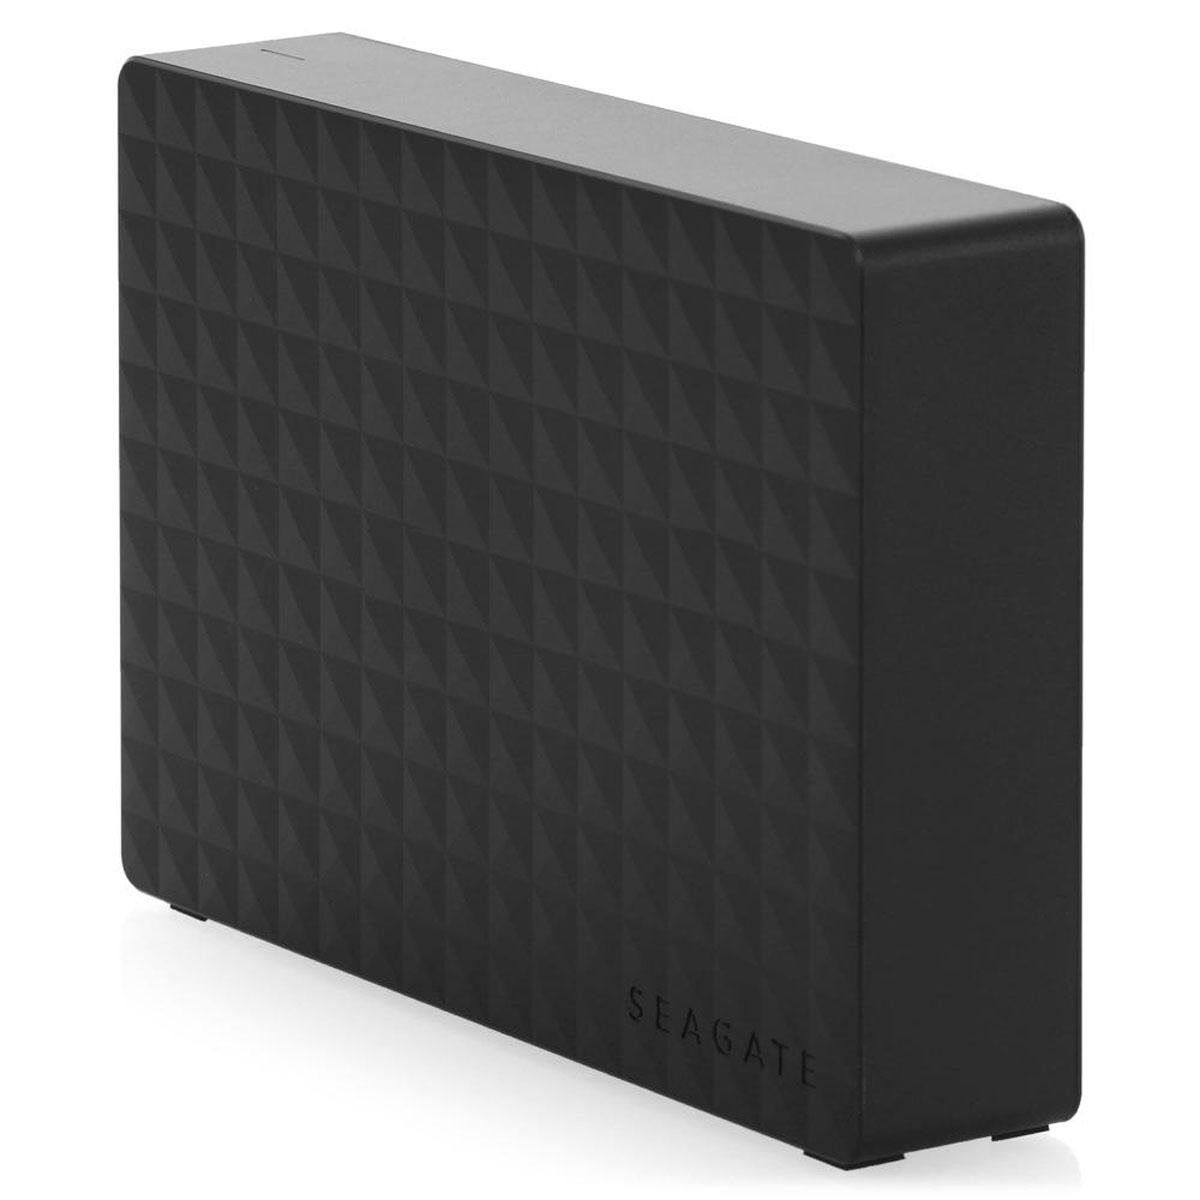 Seagate Expansion 2TB (STEB2000200) внешний жесткий диск - Носители информации